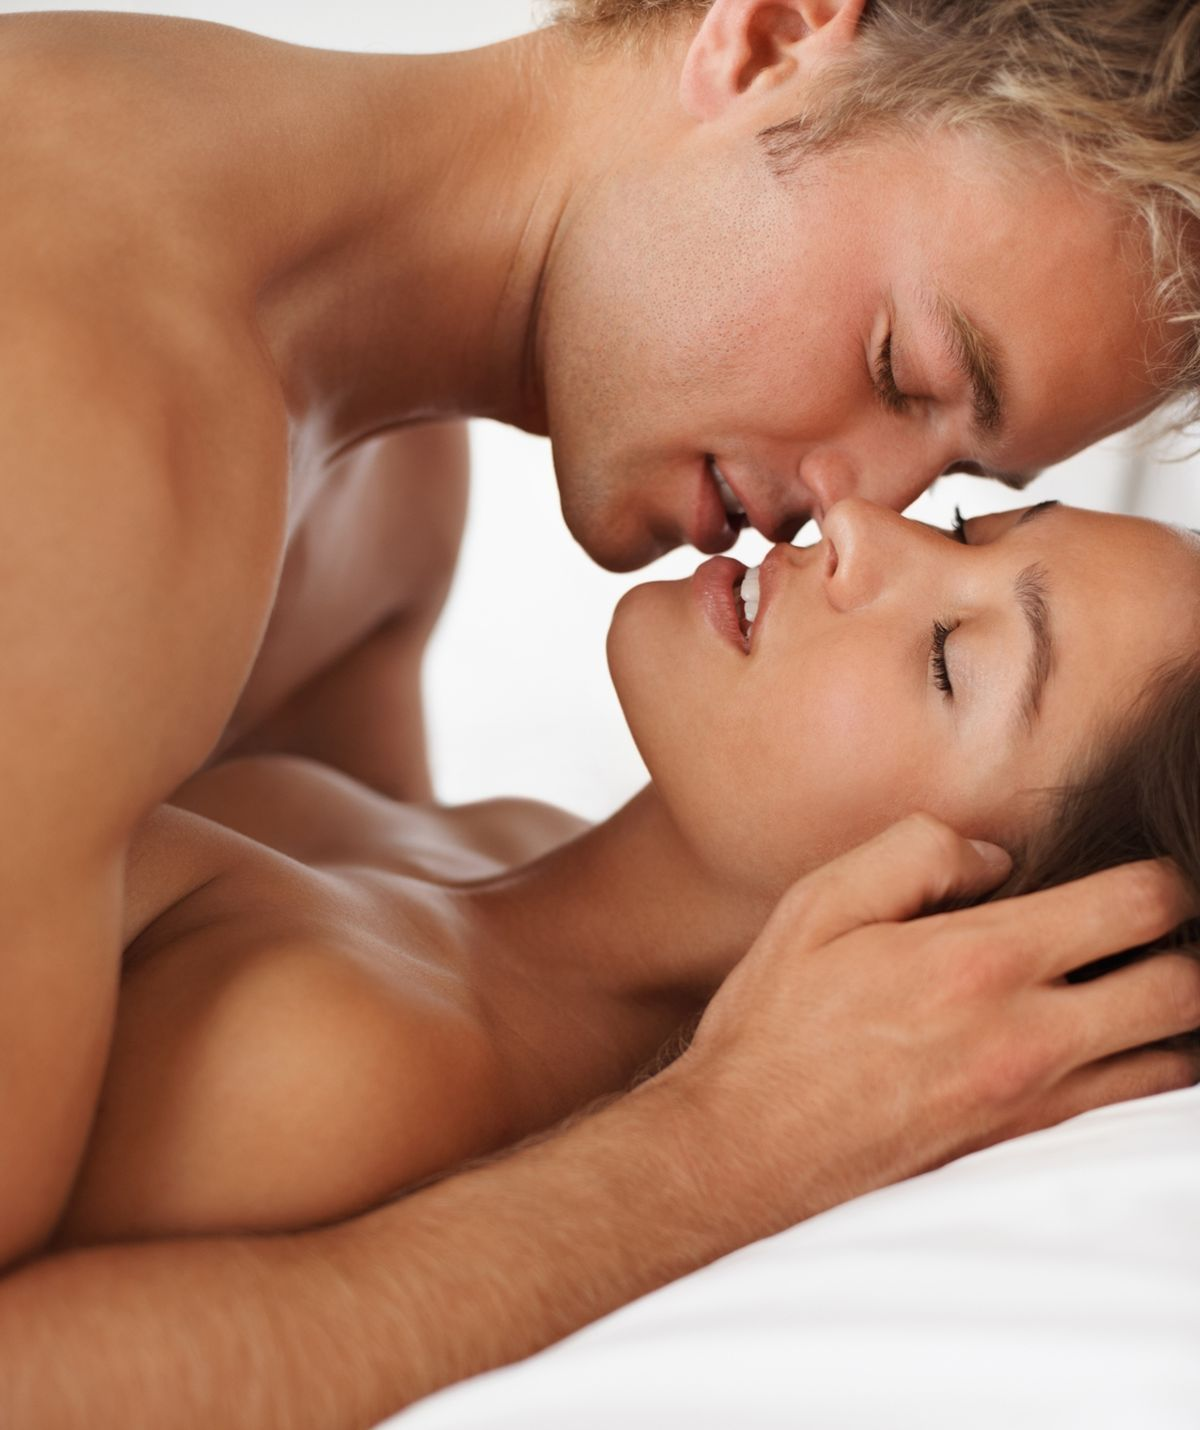 Steamy romance short stories